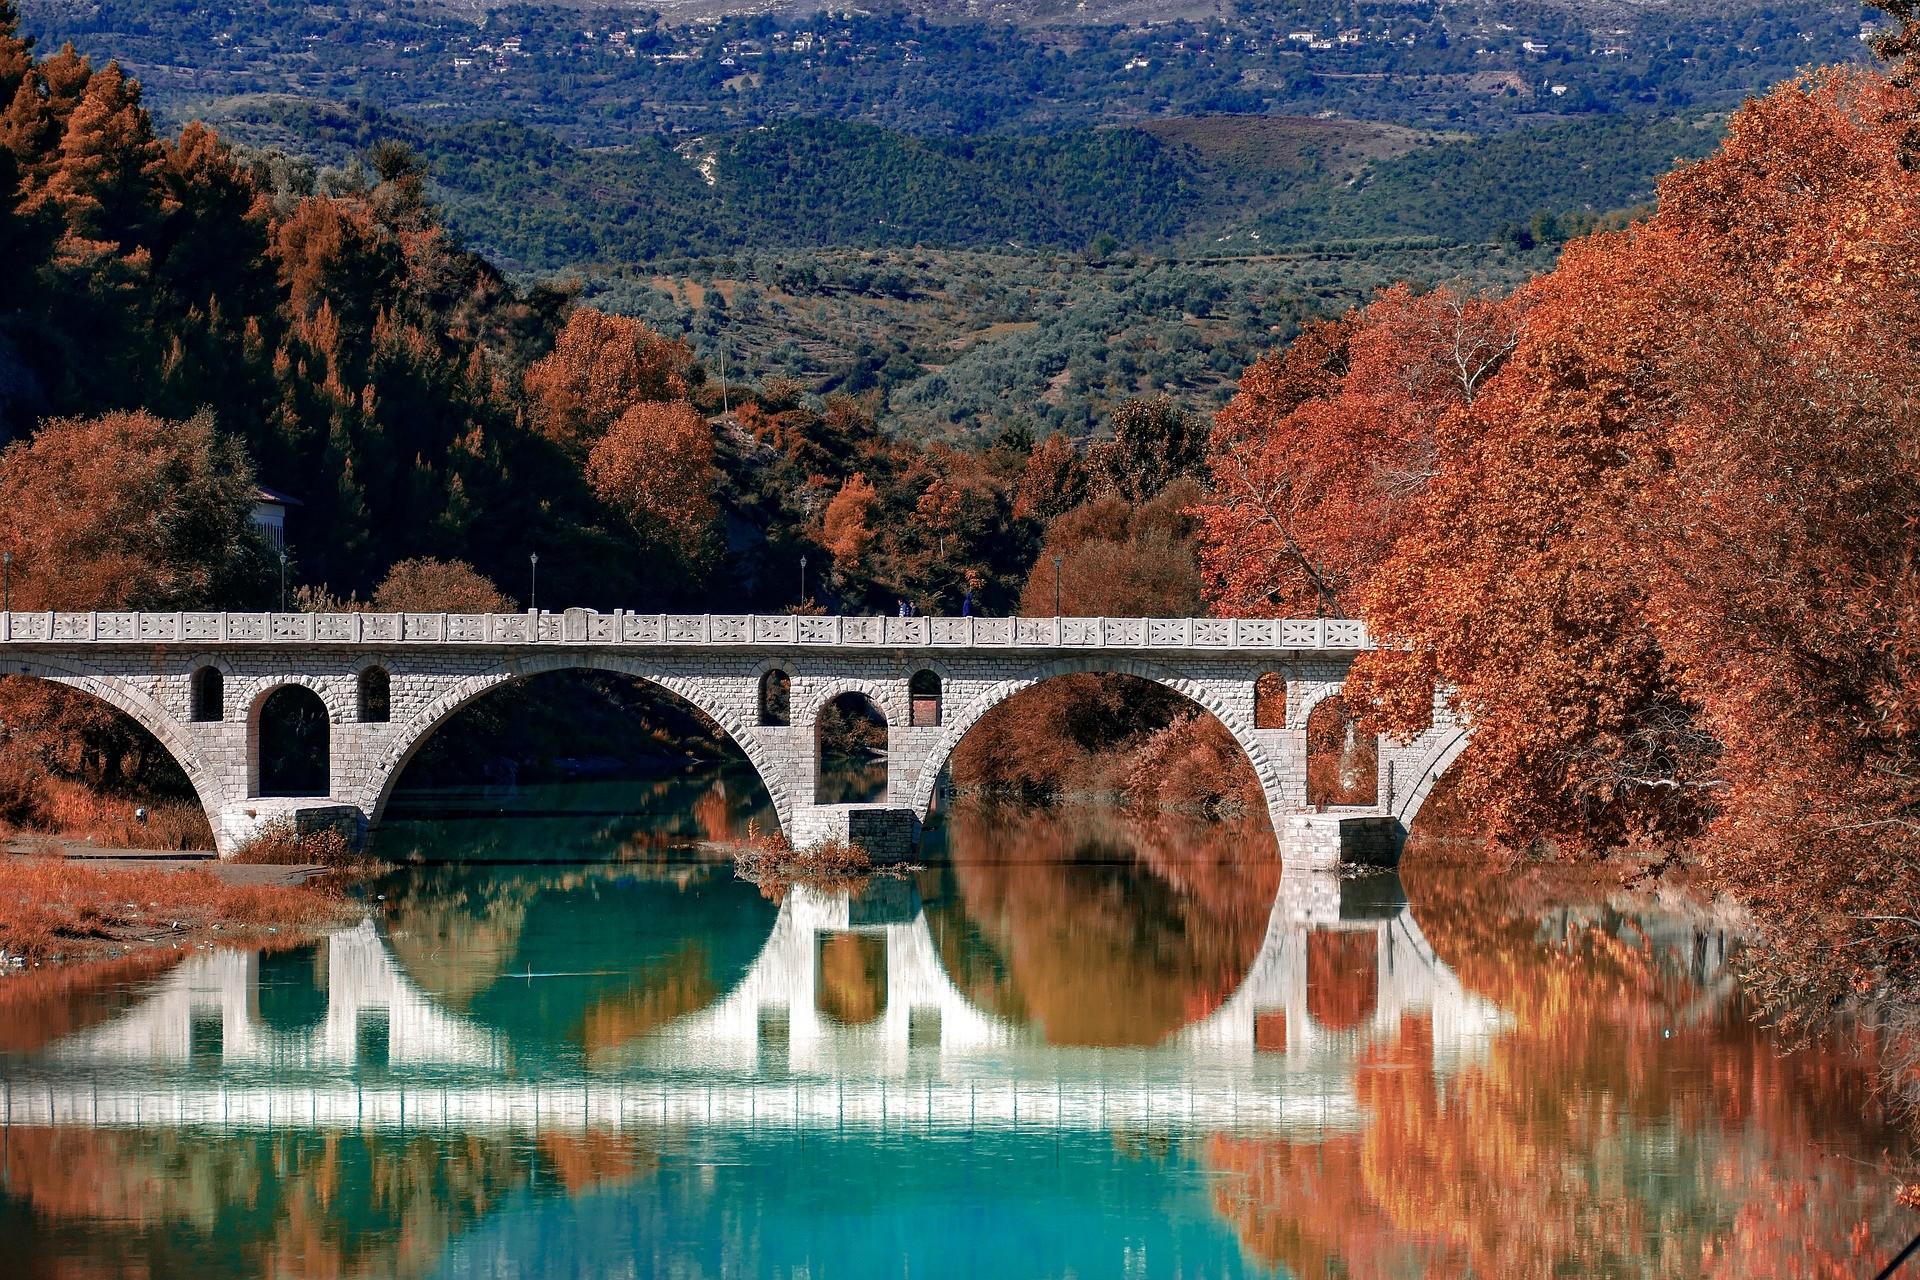 Romeinse brug bij Berat, Albanië